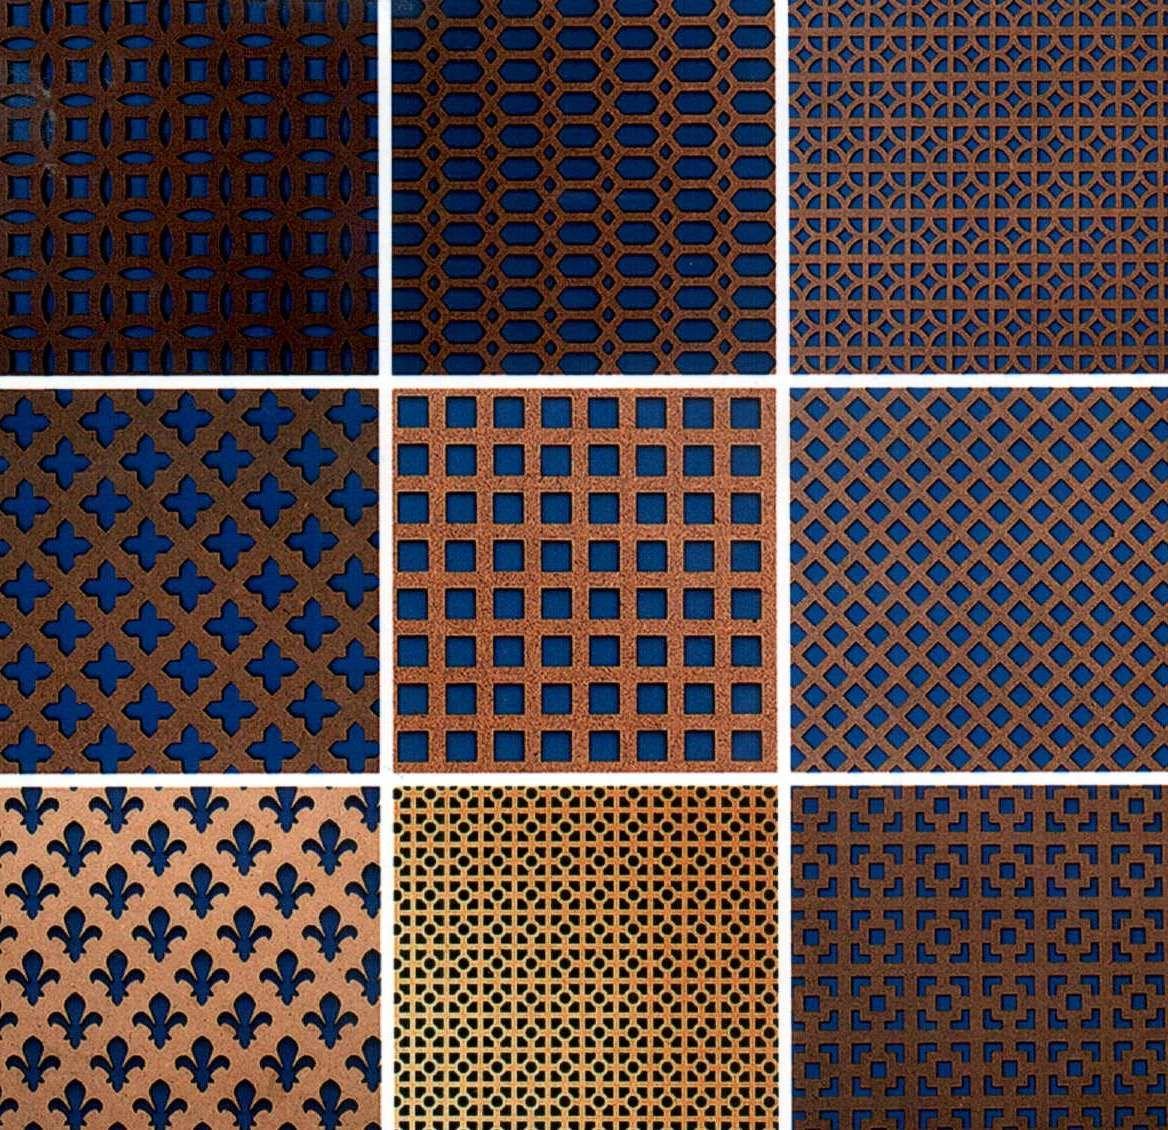 decorative metal screen sheet material screening panels come in 13 different patterns - Decorative Metal Screen